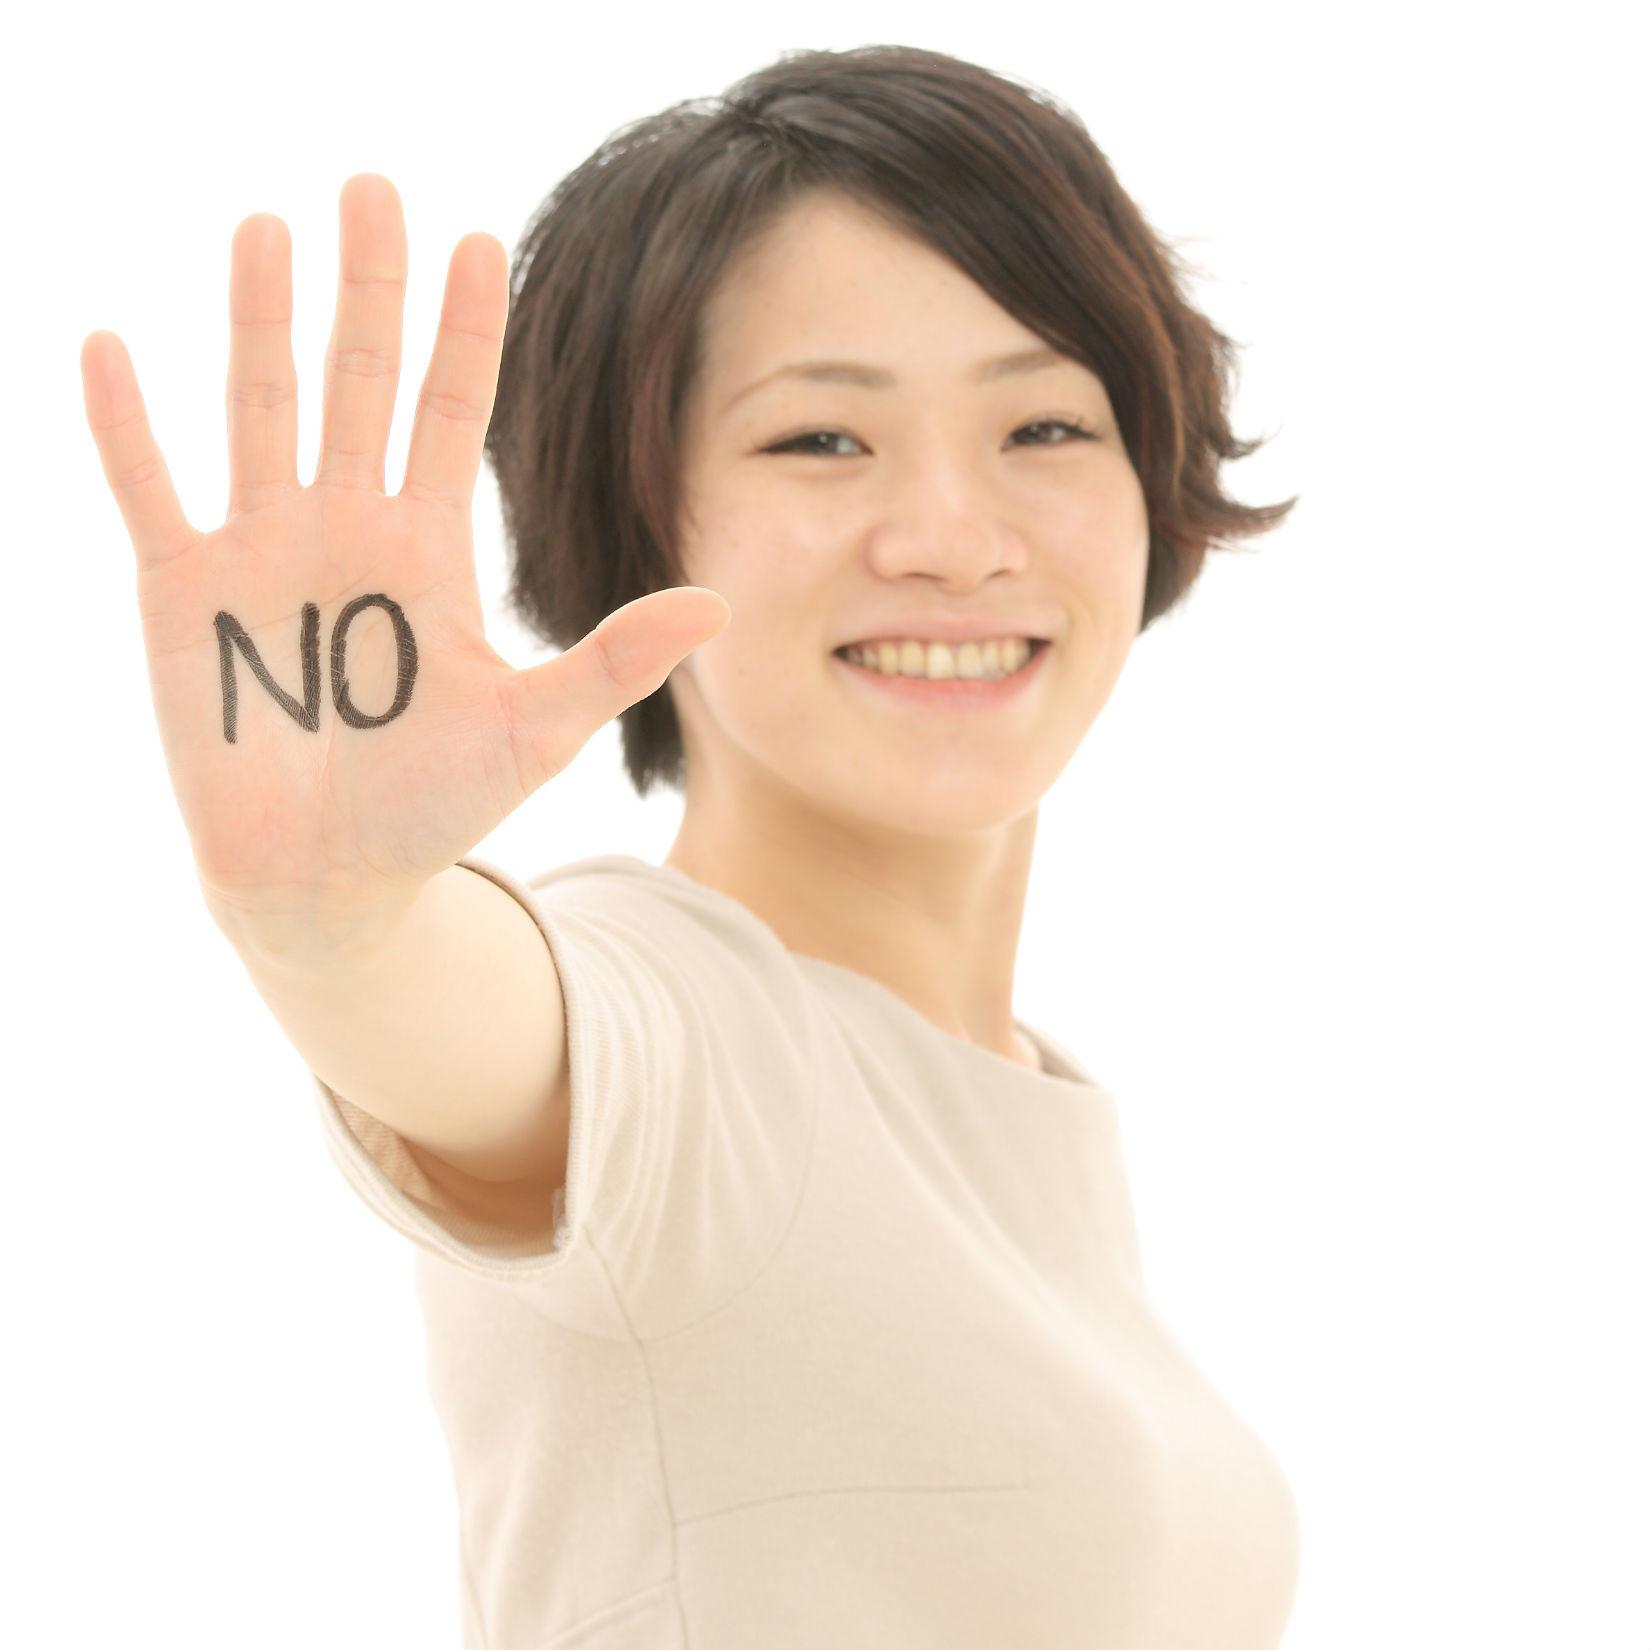 372_TOP_NOと言う女性